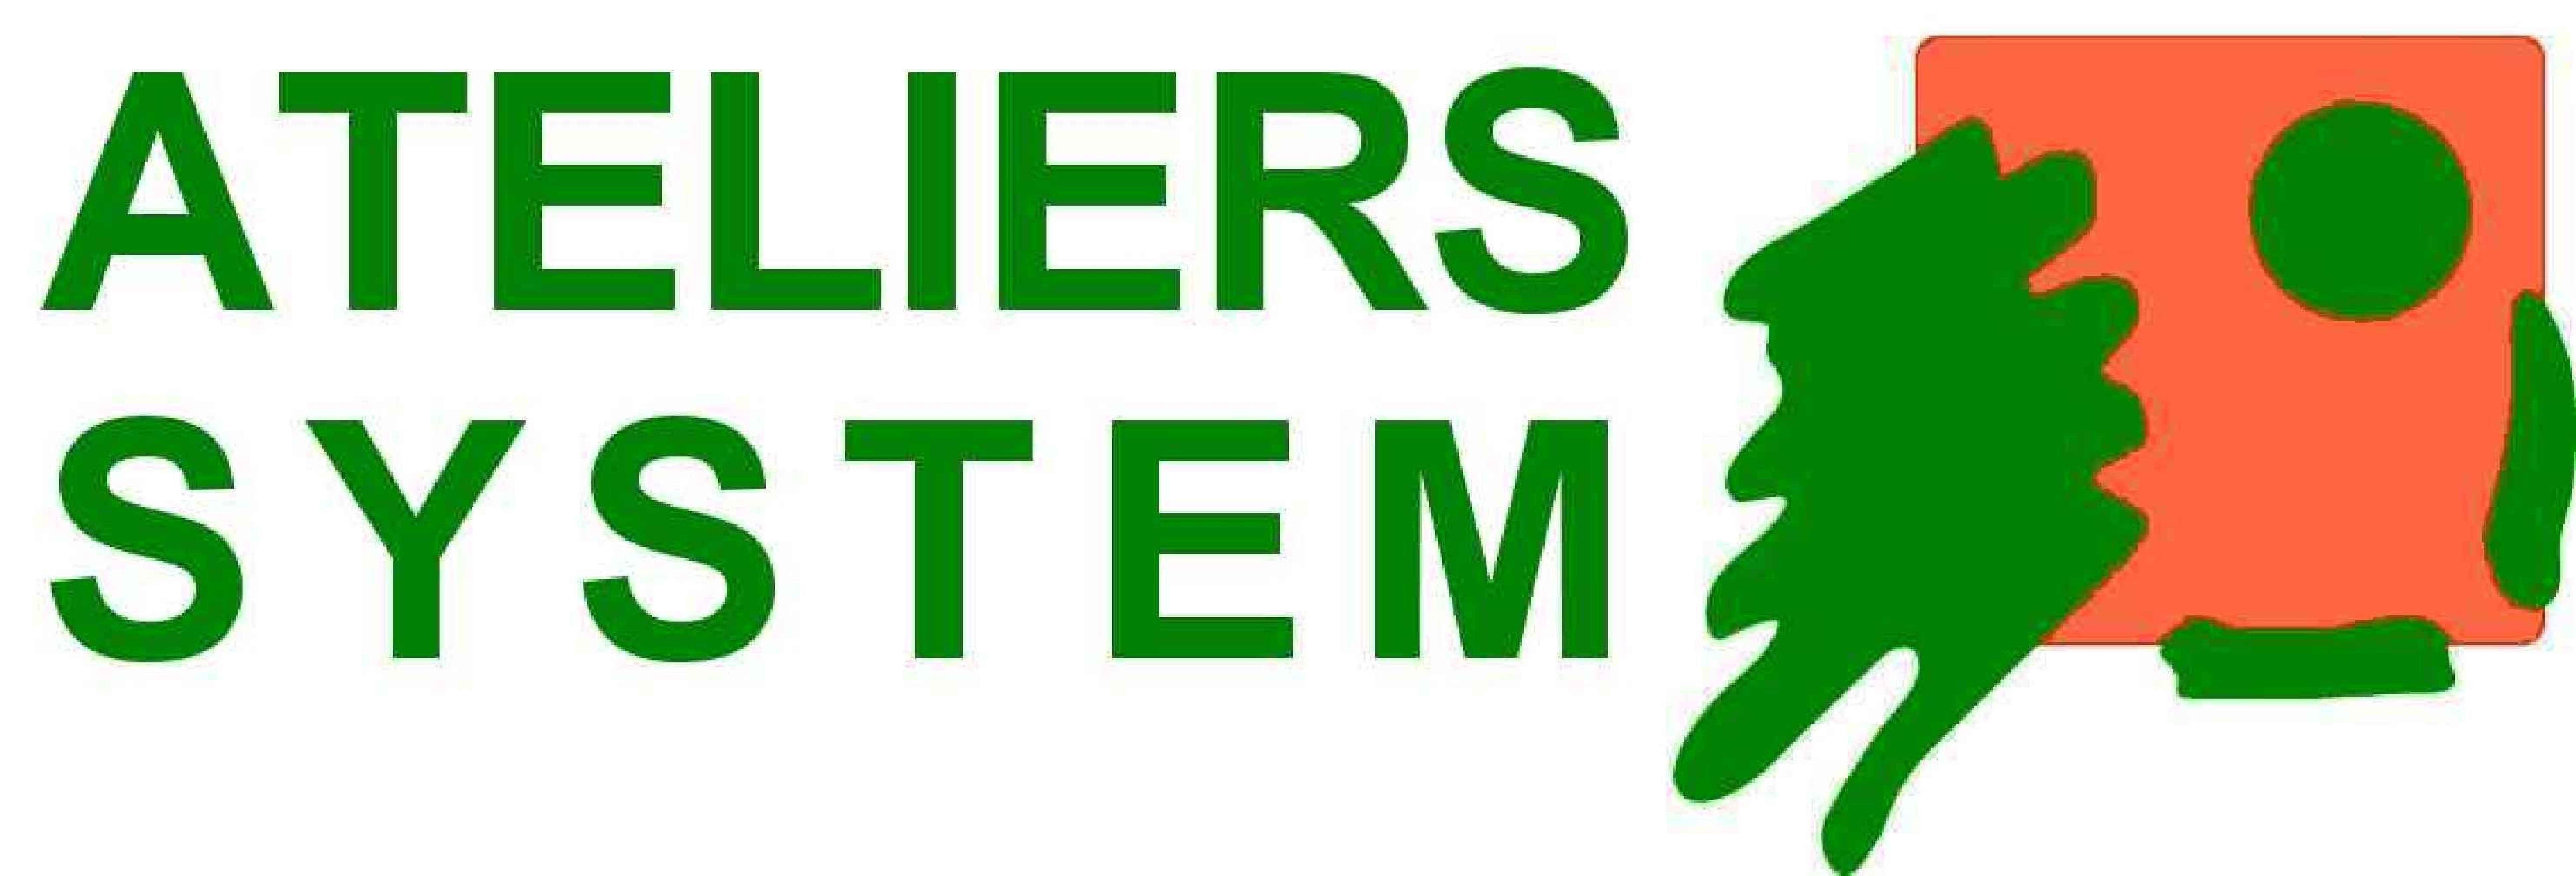 1546866842-ateliers-system.jpg